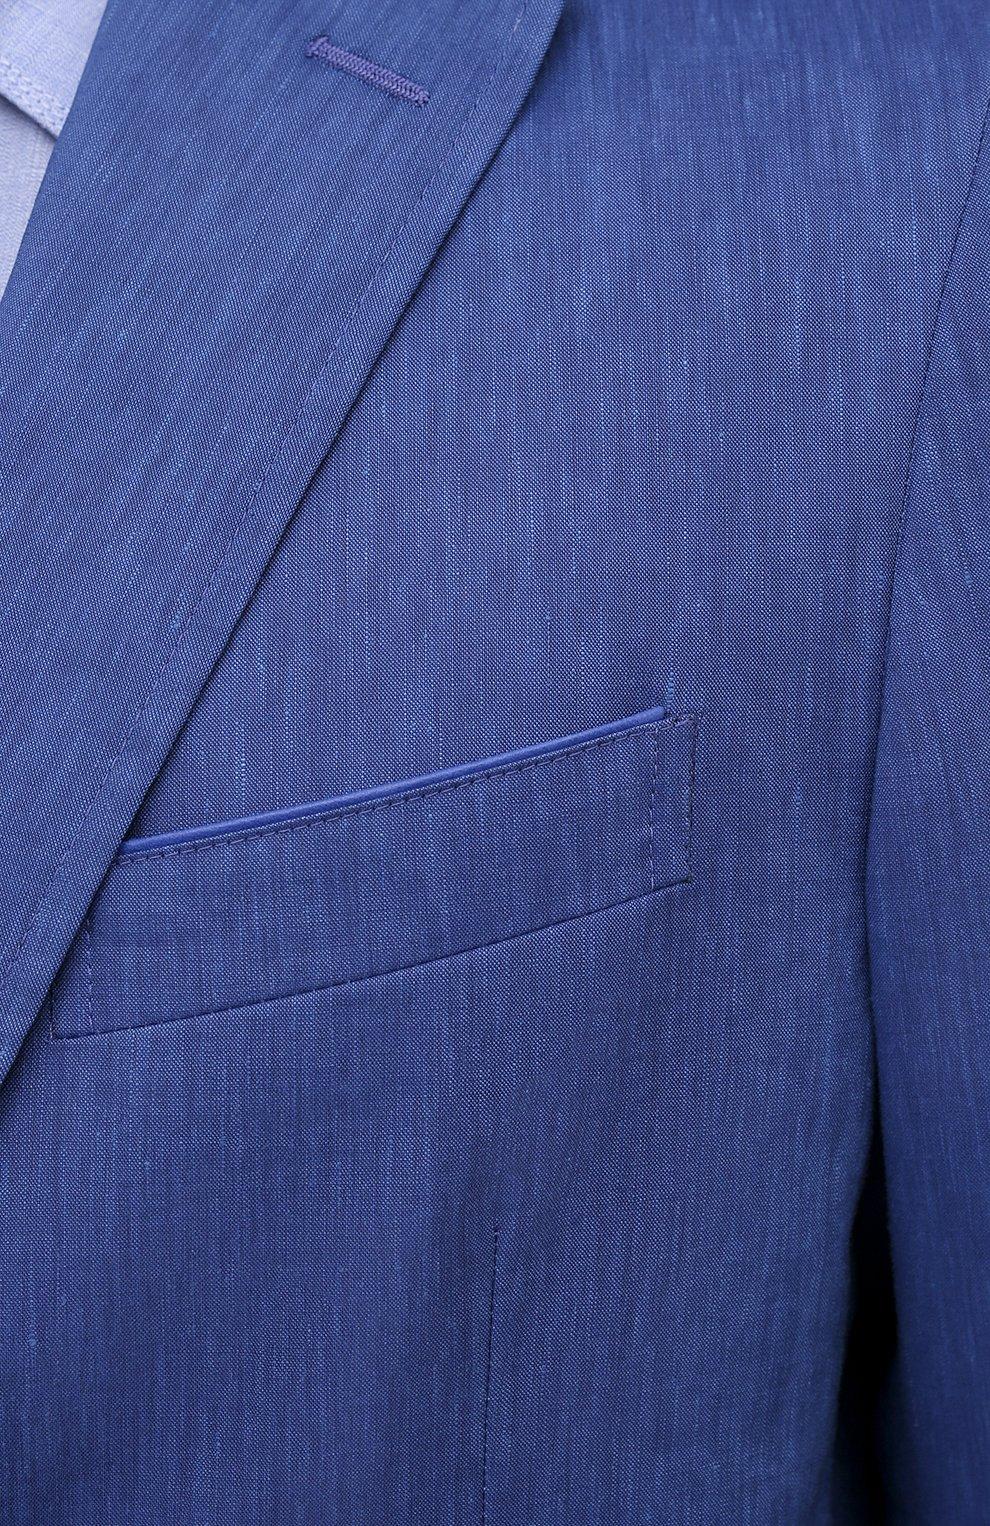 Мужской пиджак из шерсти и льна ZILLI темно-синего цвета, арт. MNV-ECKX-2-E6031/0001 | Фото 5